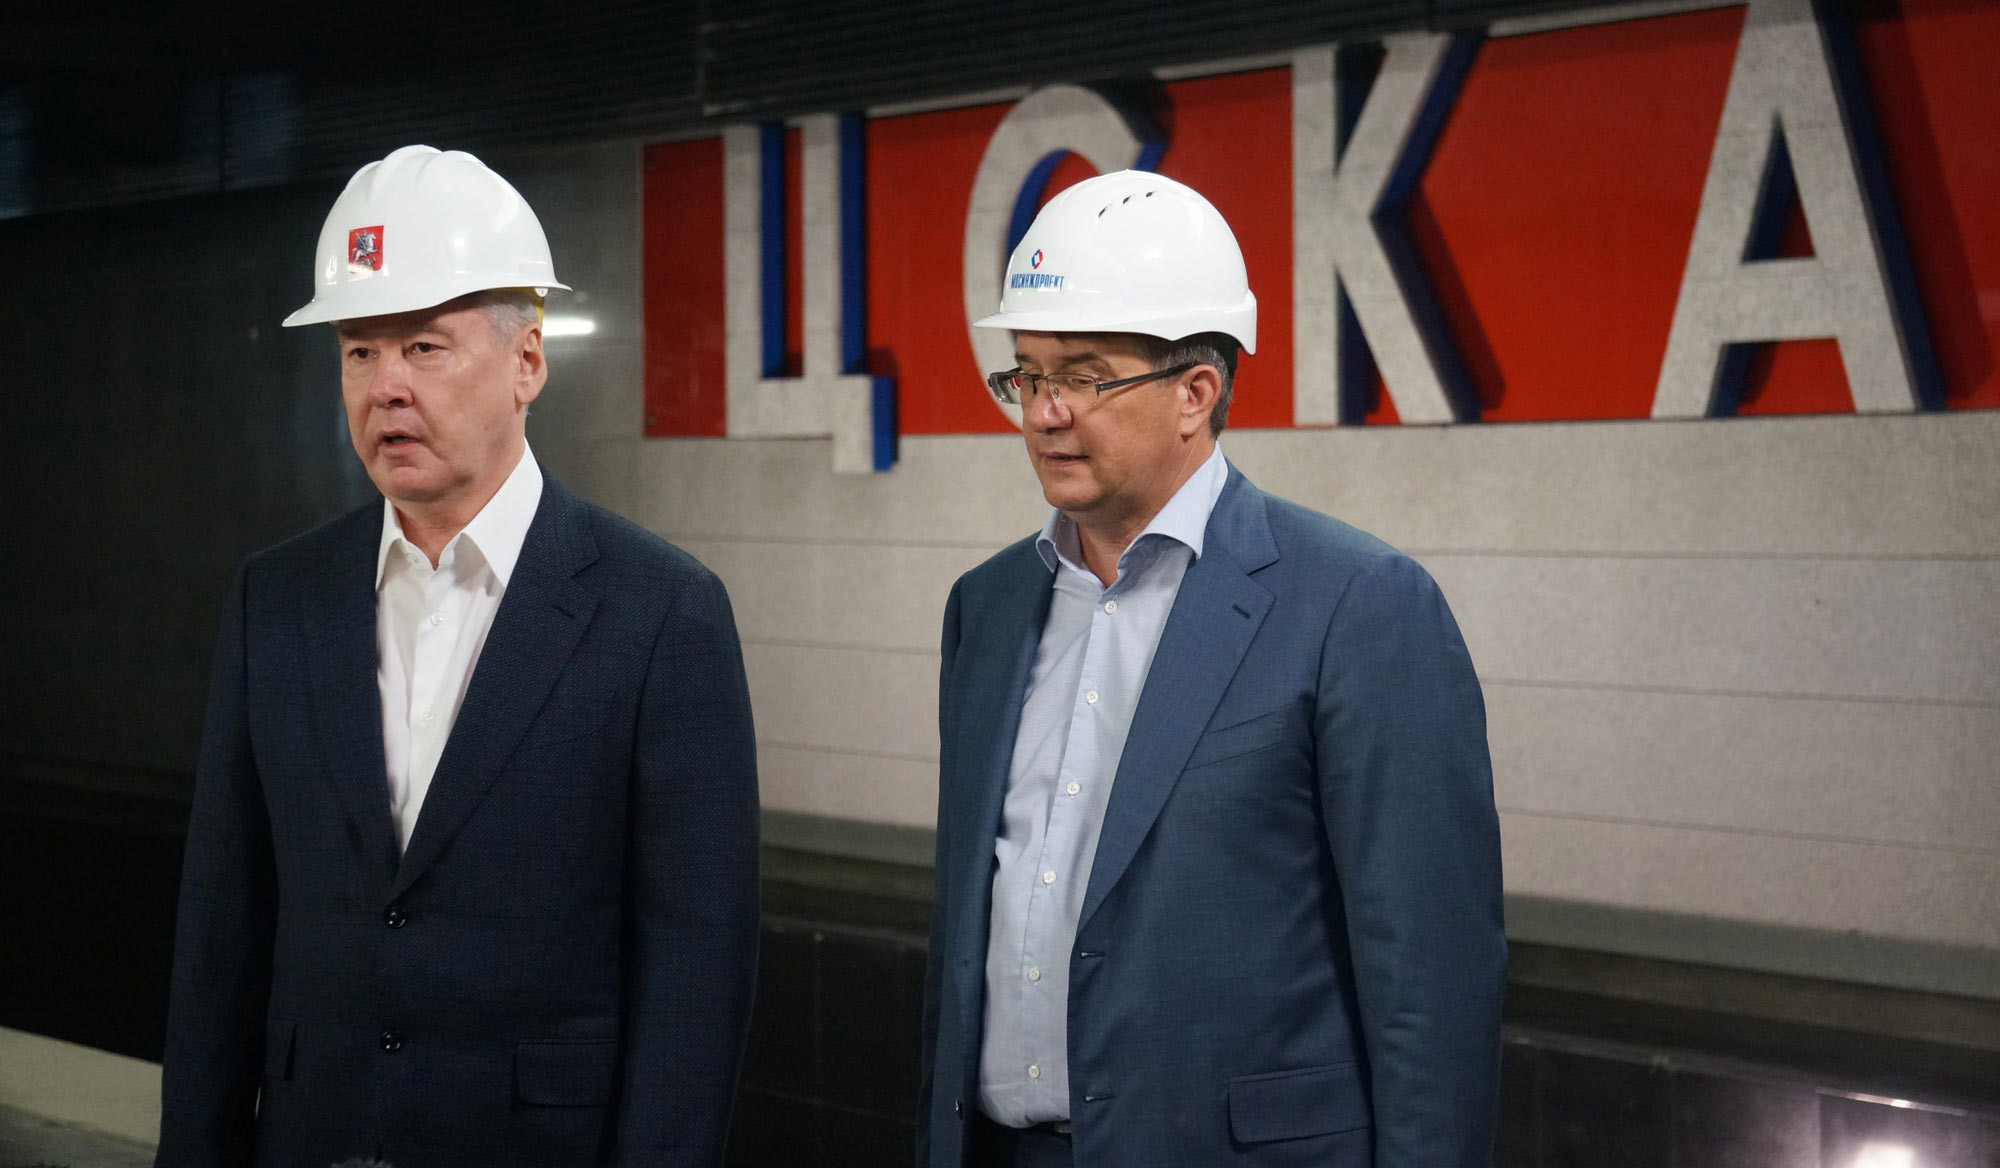 Фото: © РИА Новости/Сергей Дрюцкий